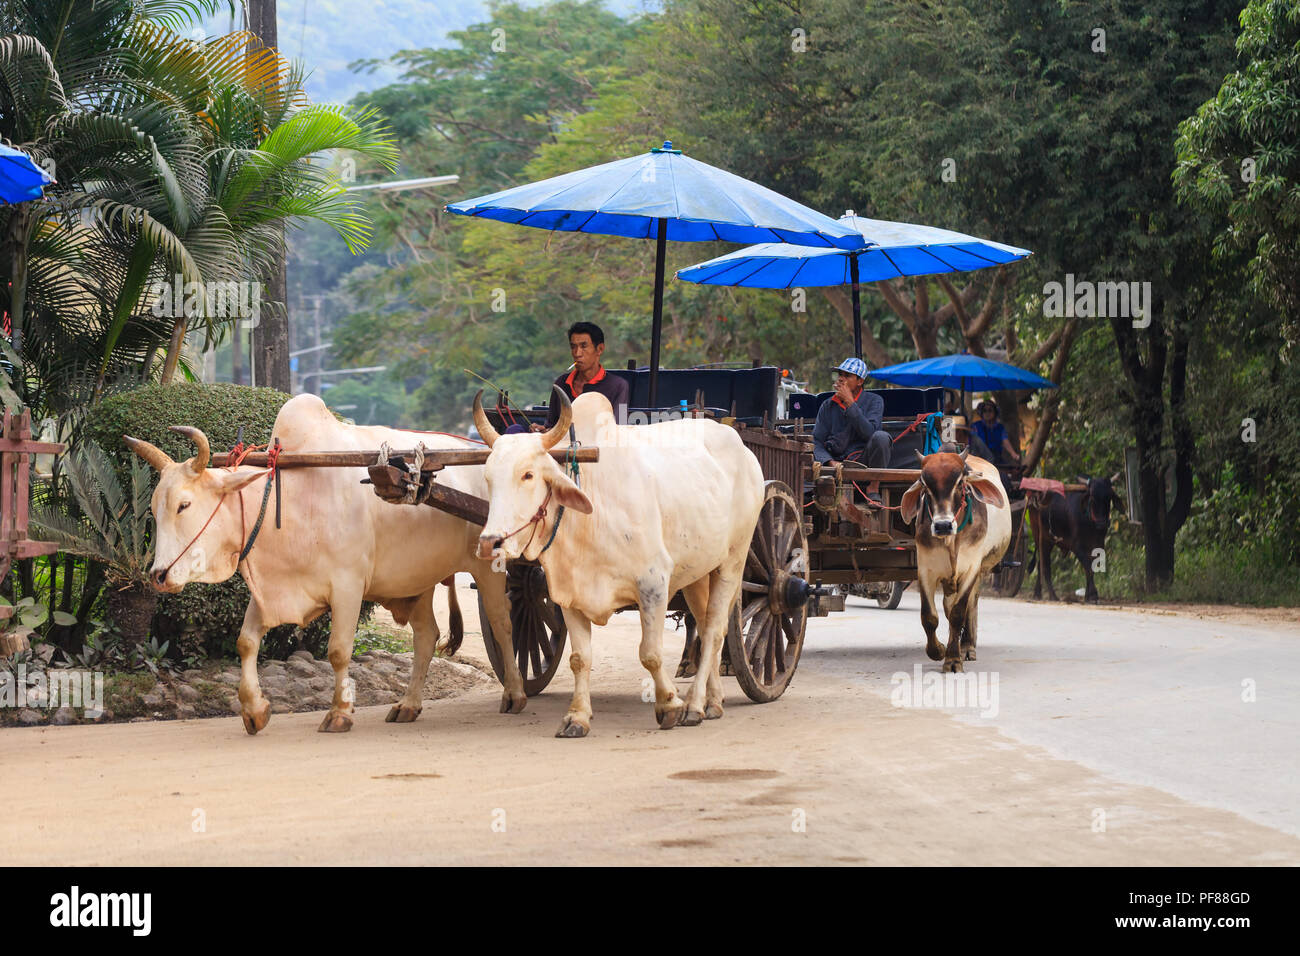 Traveller tourist enjoy travel on ox cart through jungle in national park - Stock Image